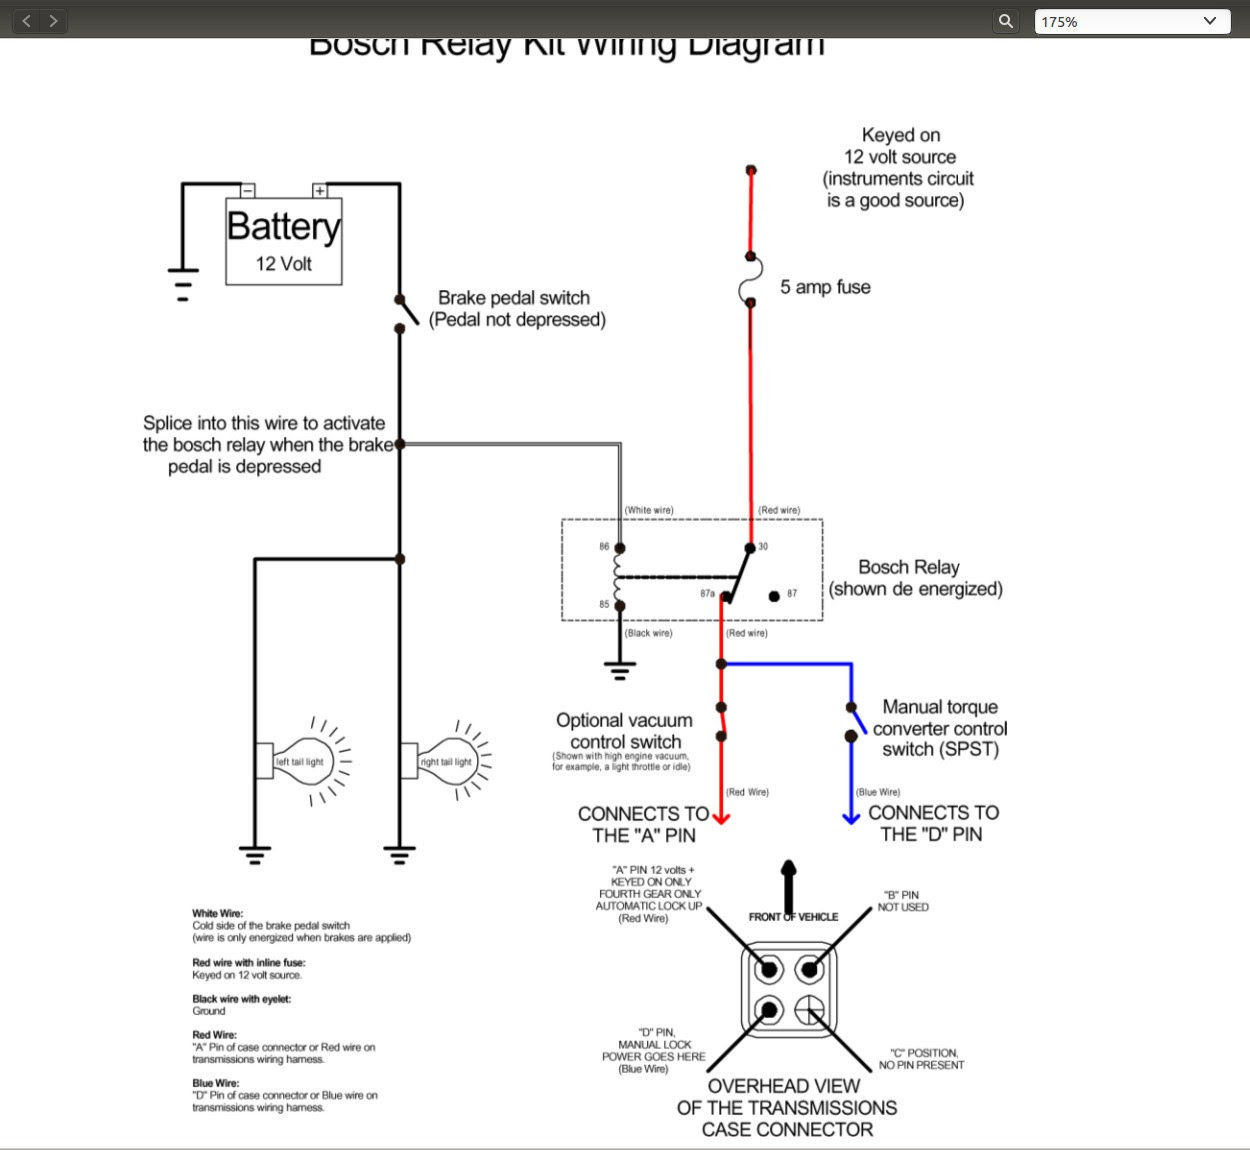 700r4 Wiring Diagram Factory - Wiring Diagram NetworksWiring Diagram Networks - blogger